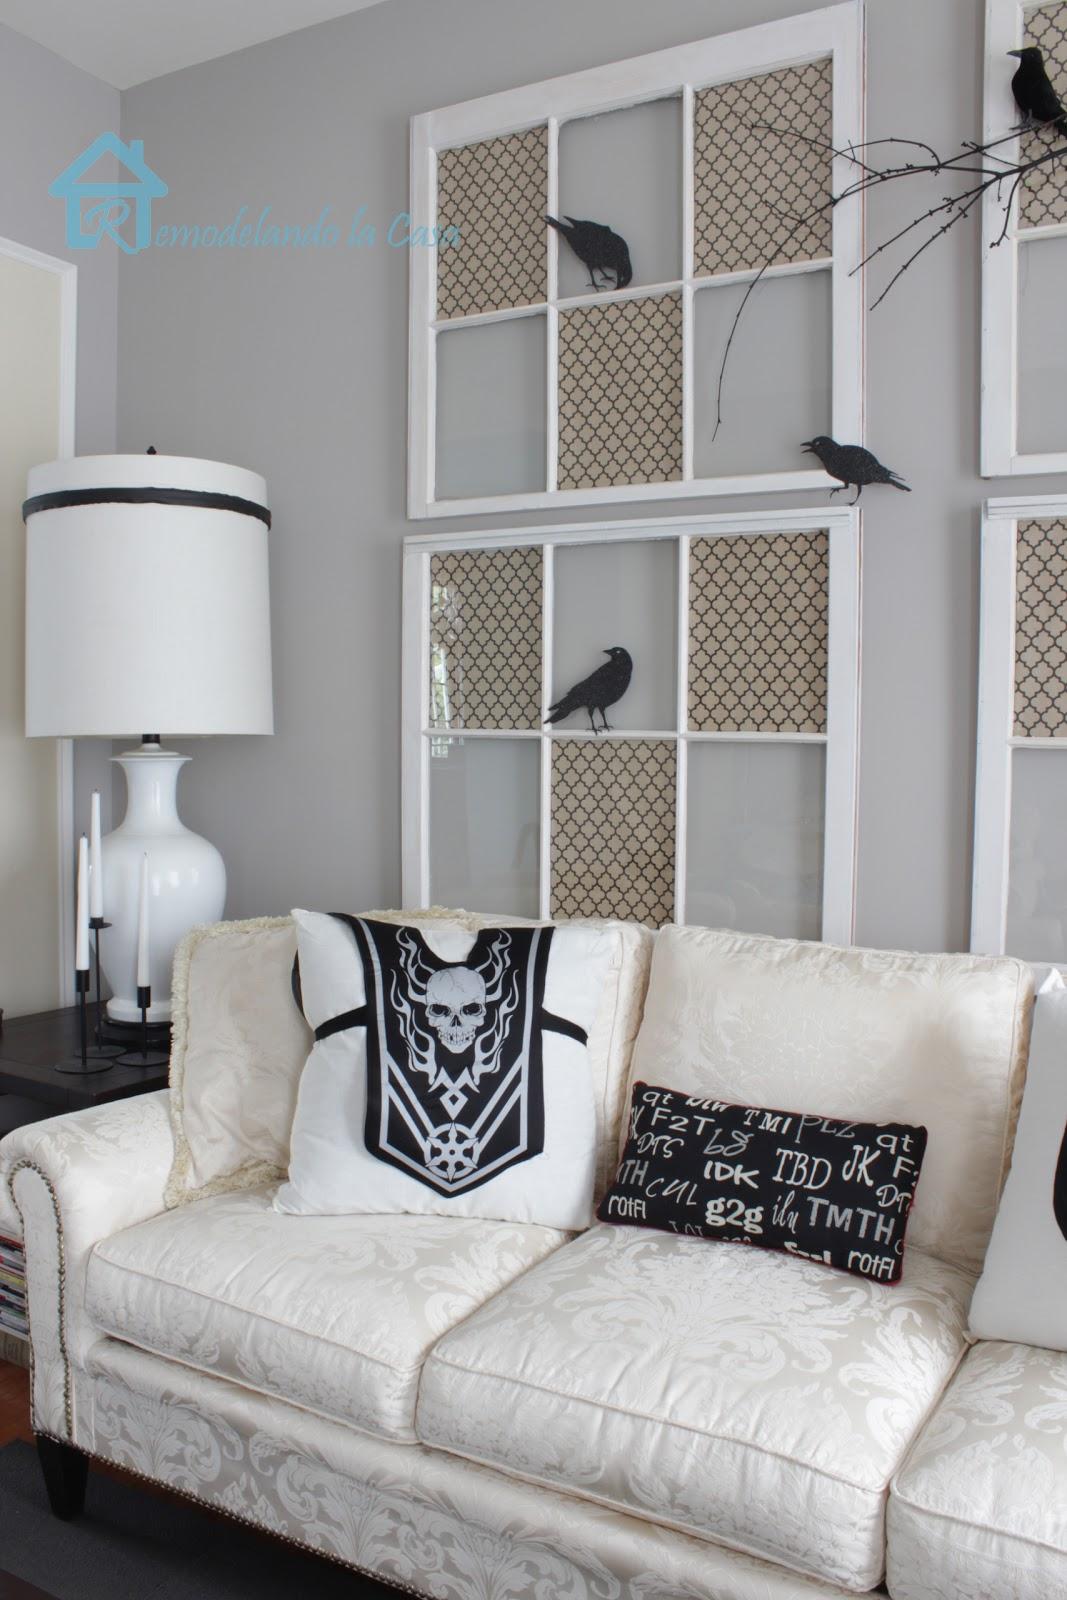 Fullsize Of Decorated Living Room